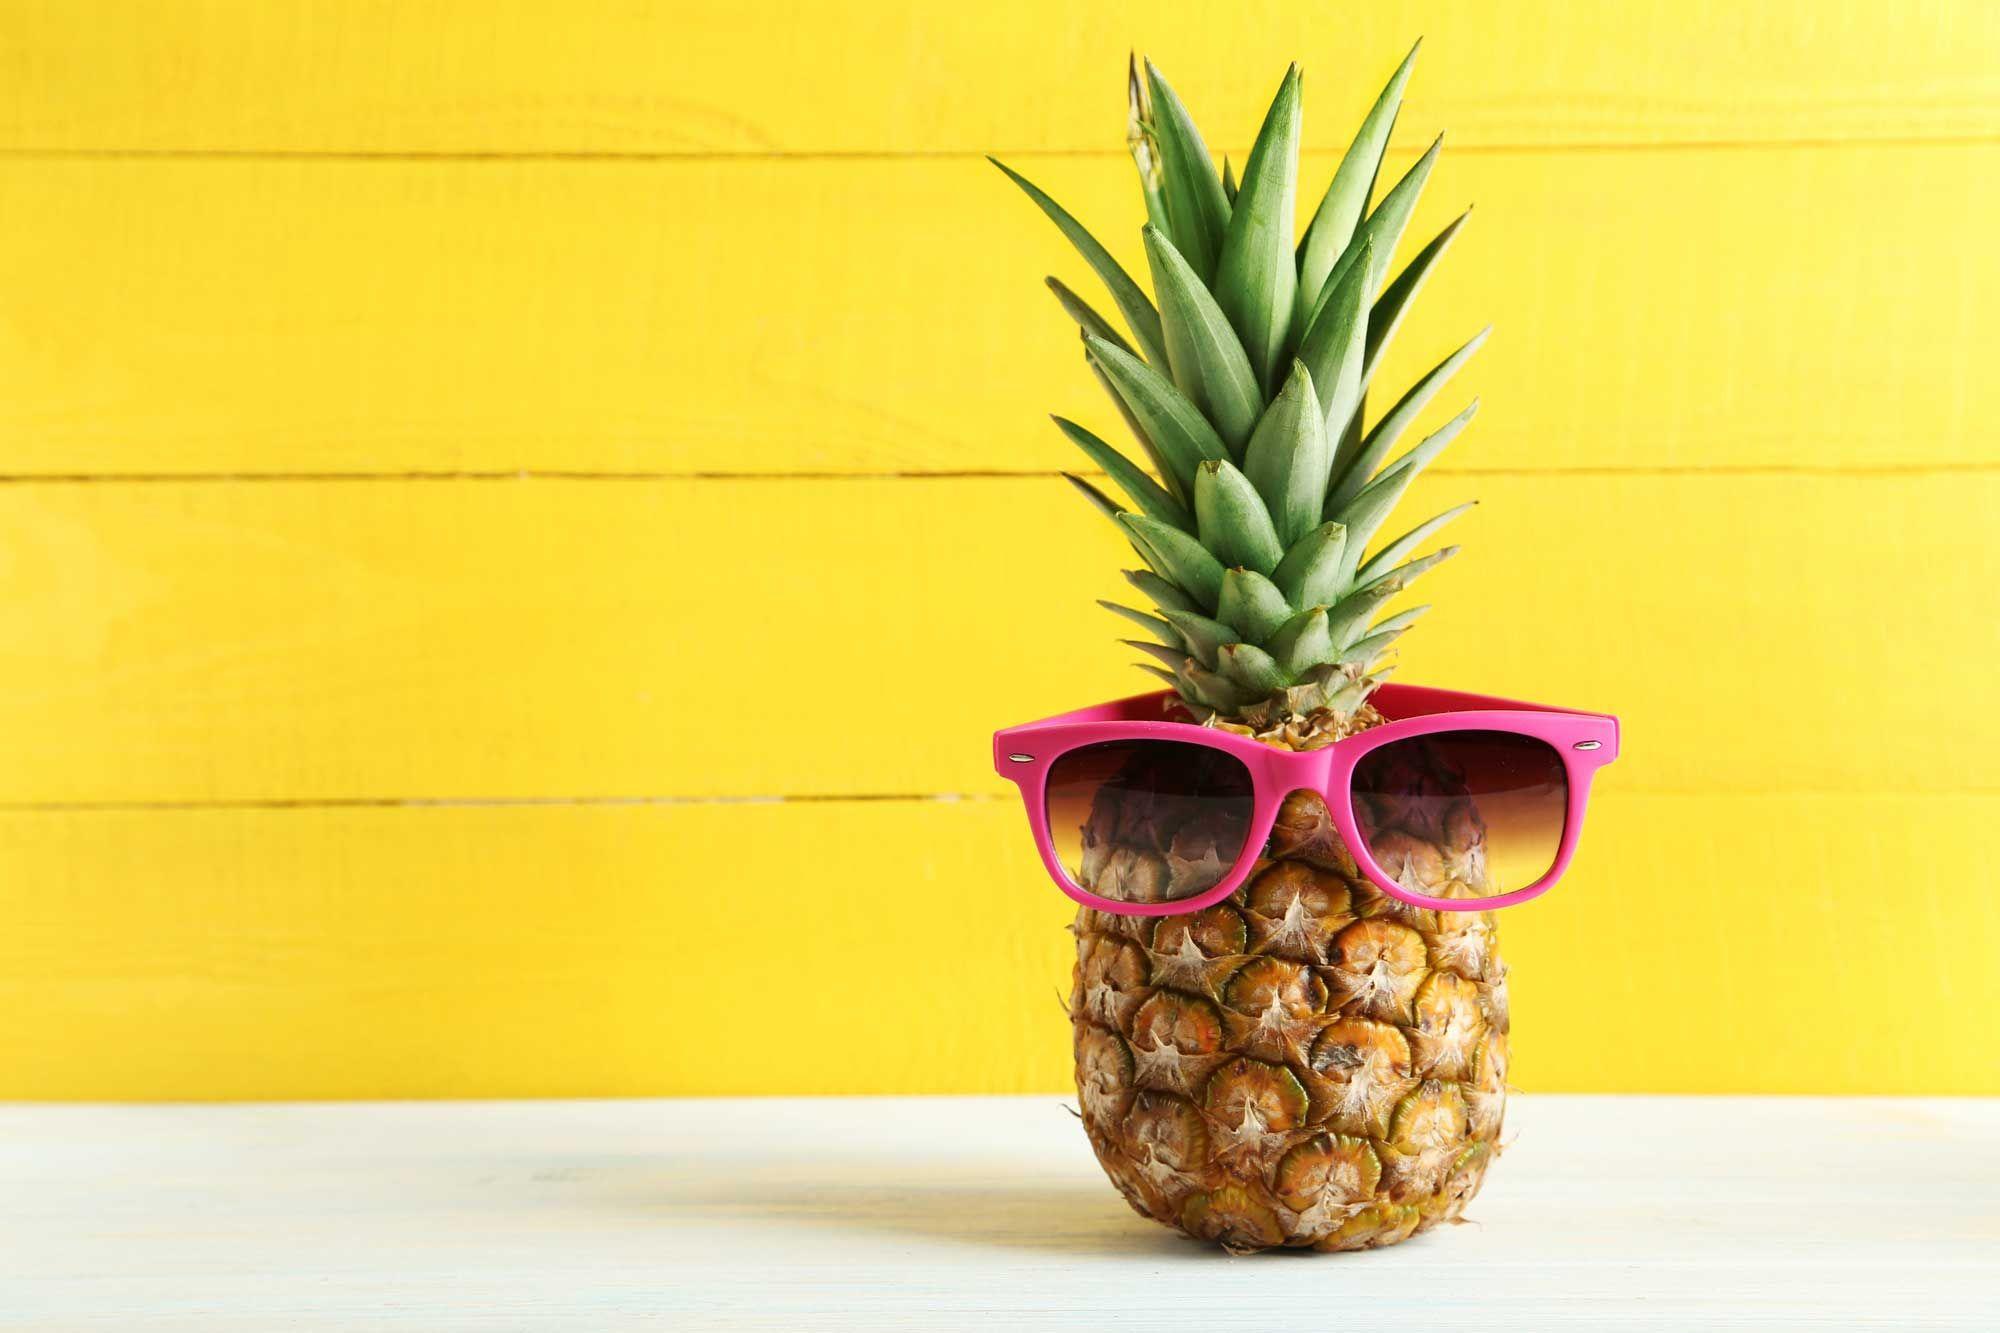 Cool Pineapple Sunglasses Wallpaper Desktop Best Wallpaper Hd Pineapple Wallpaper Iphone Wallpaper Pineapple Desktop Wallpaper Summer